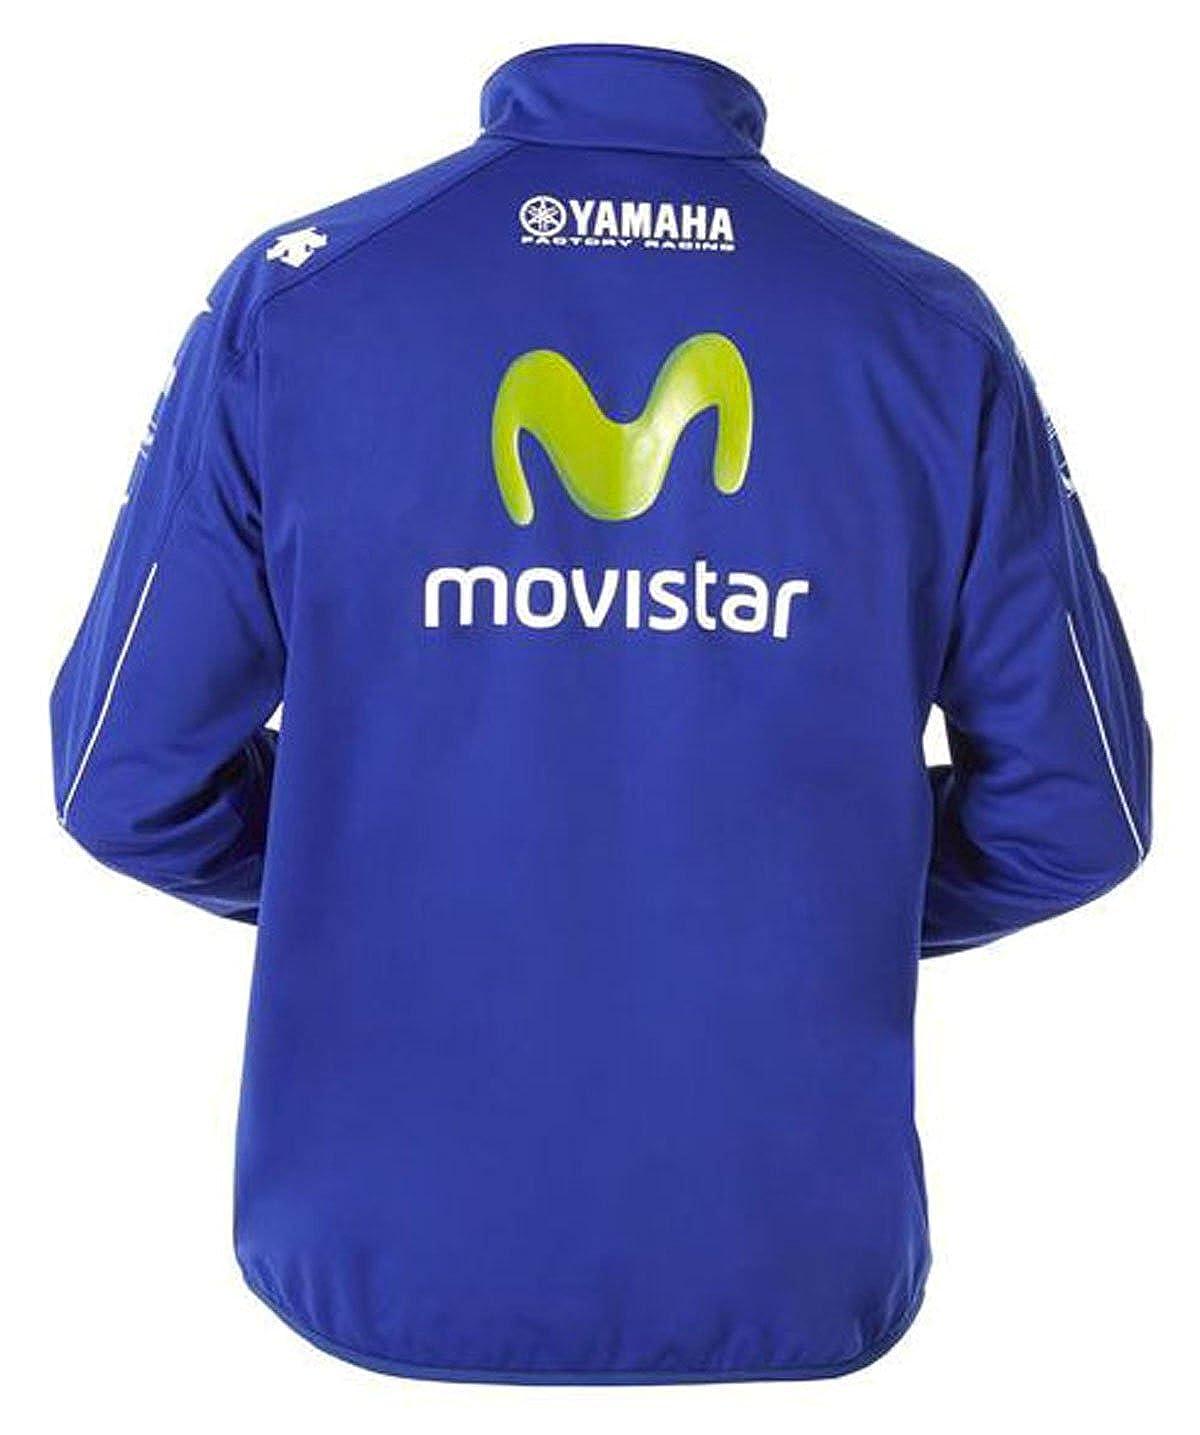 Yamaha - Chaqueta - para Hombre Azul Large: Amazon.es: Ropa ...